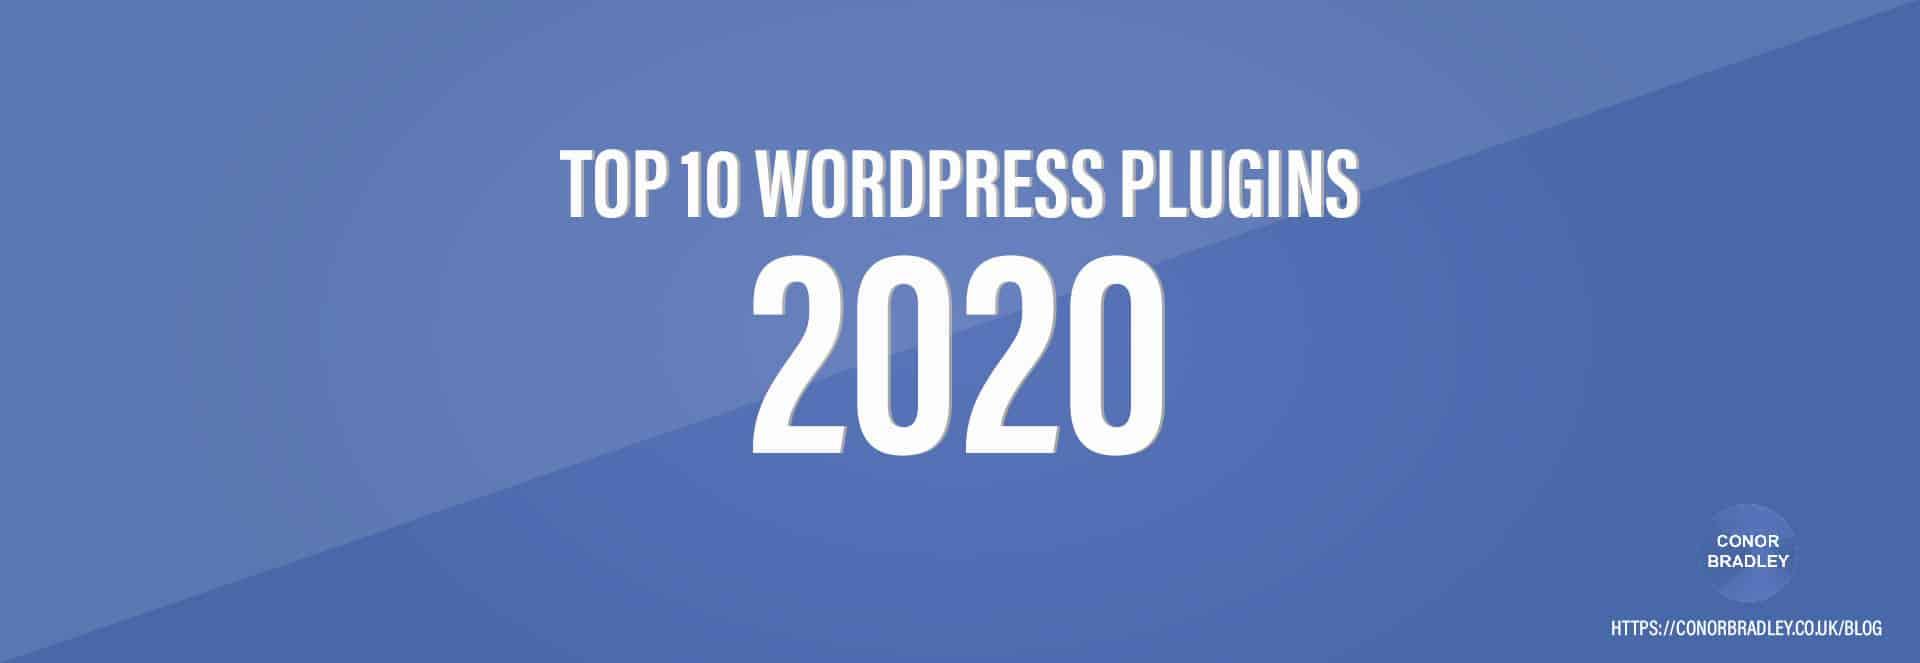 Top 10 Wordpress Plugins 2020 Banner